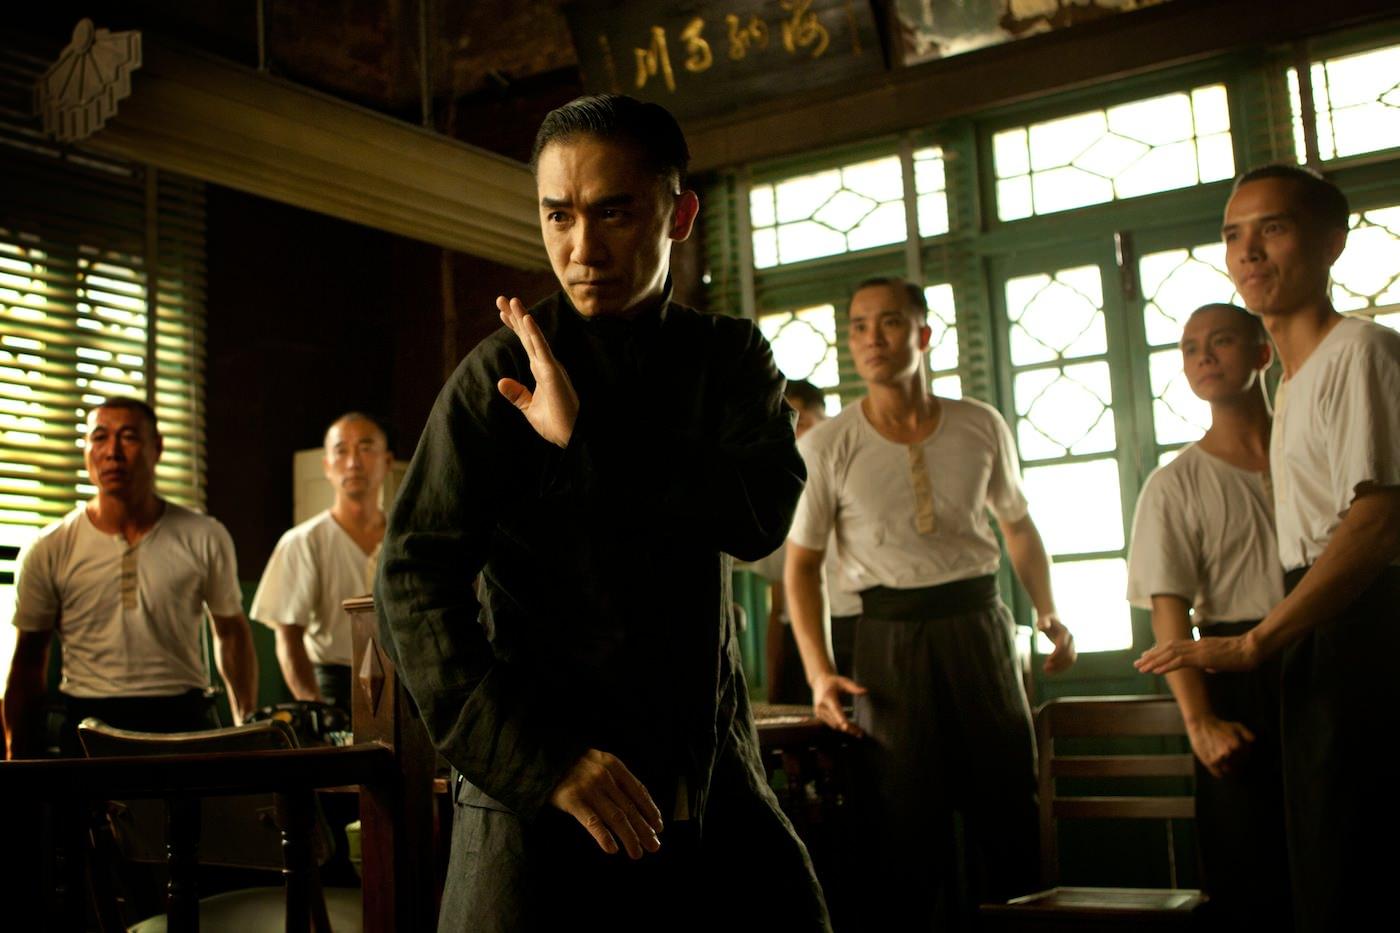 Grandmaster tony leung chiu wai